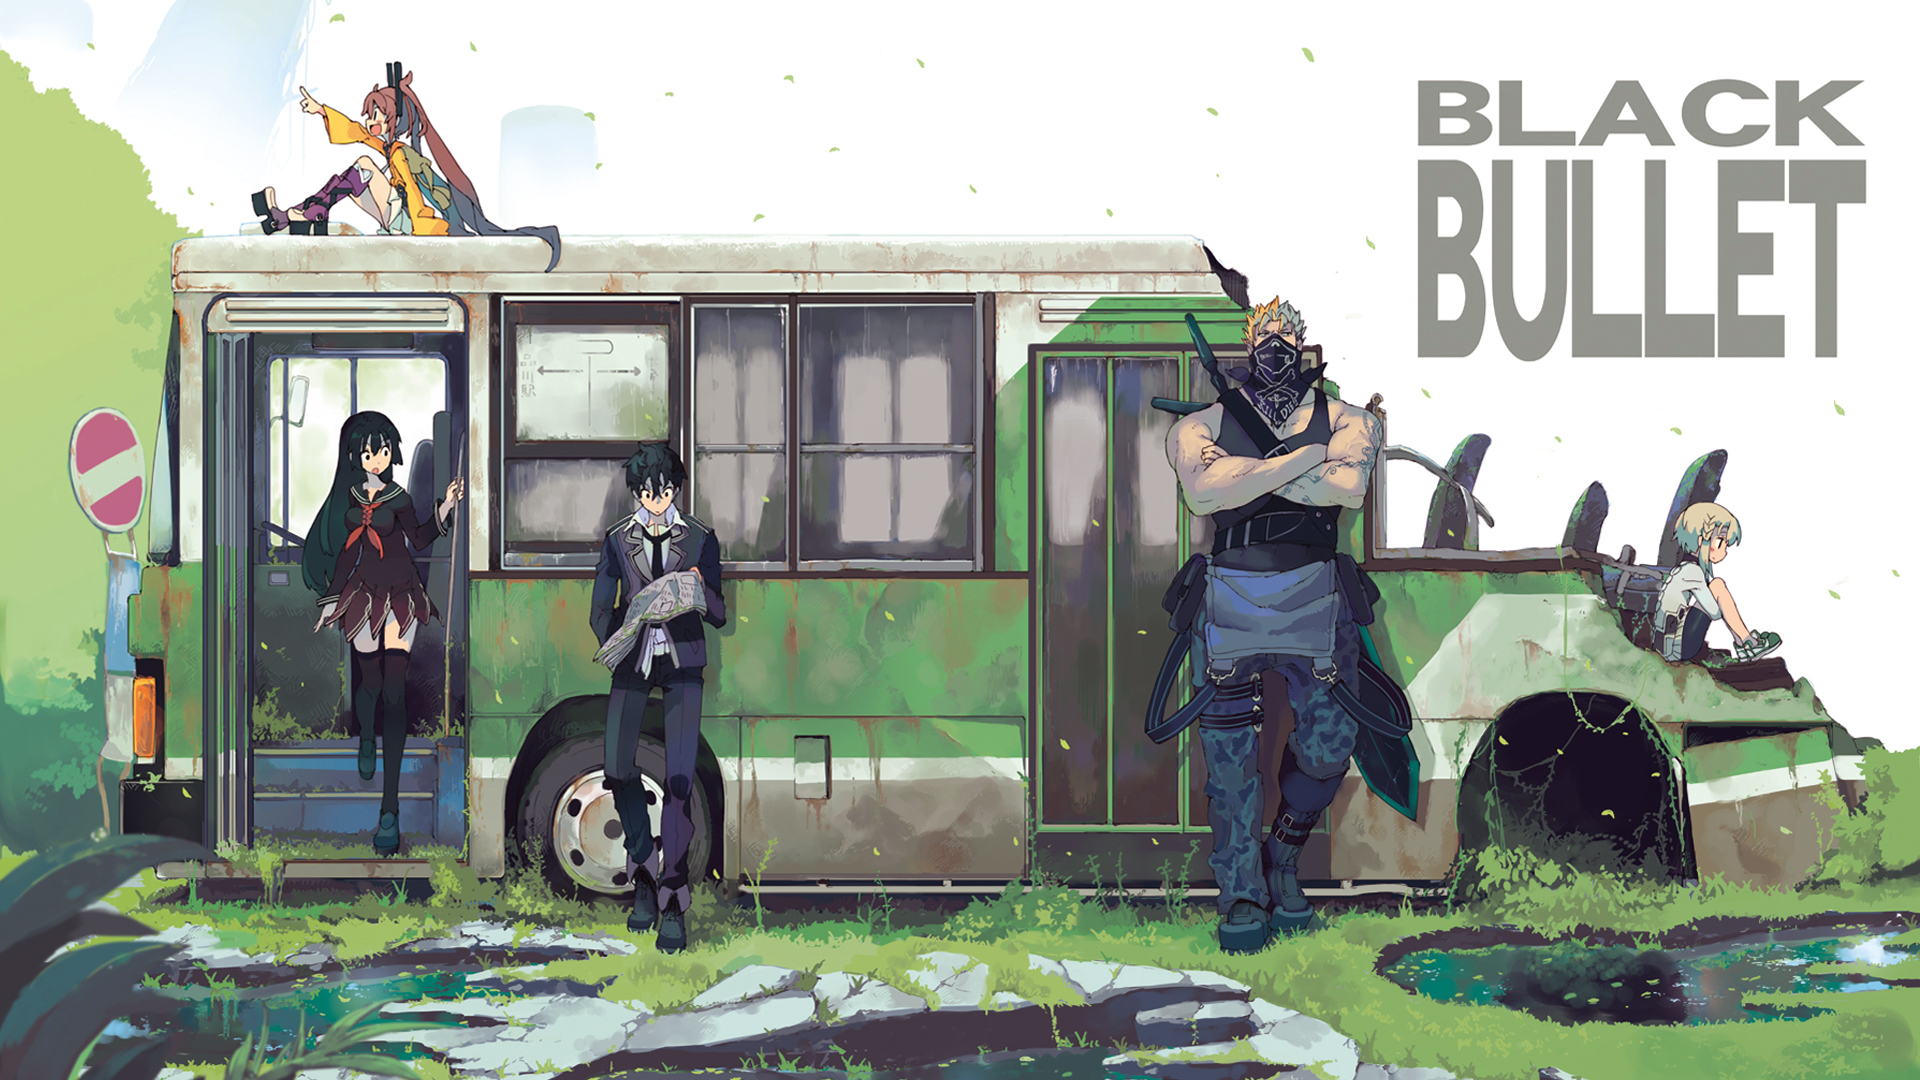 black bullet anime spring 2014 hd girls 1920x1080 1080p wallpaper and 1920x1080